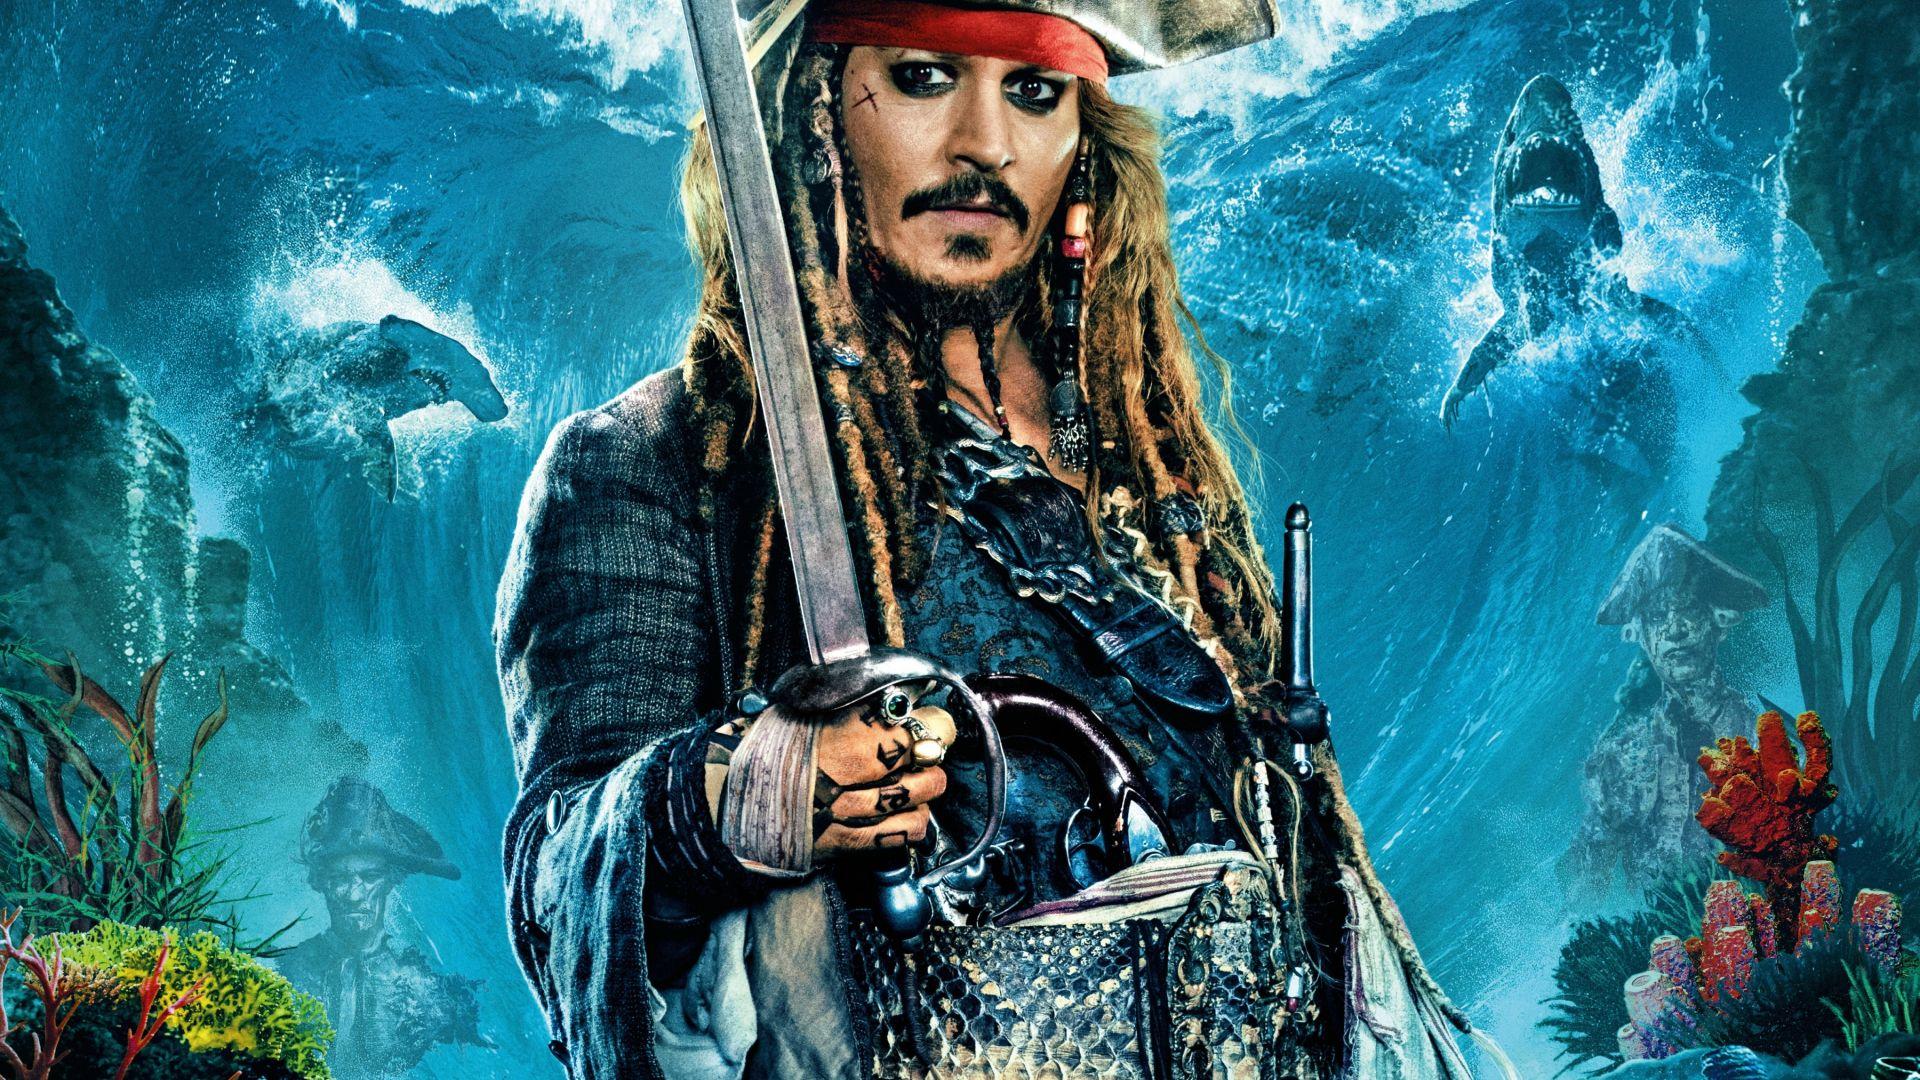 Dead Men Tell No Tales Wallpaper: Desktop Wallpaper Pirates Of The Caribbean: Dead Men Tell